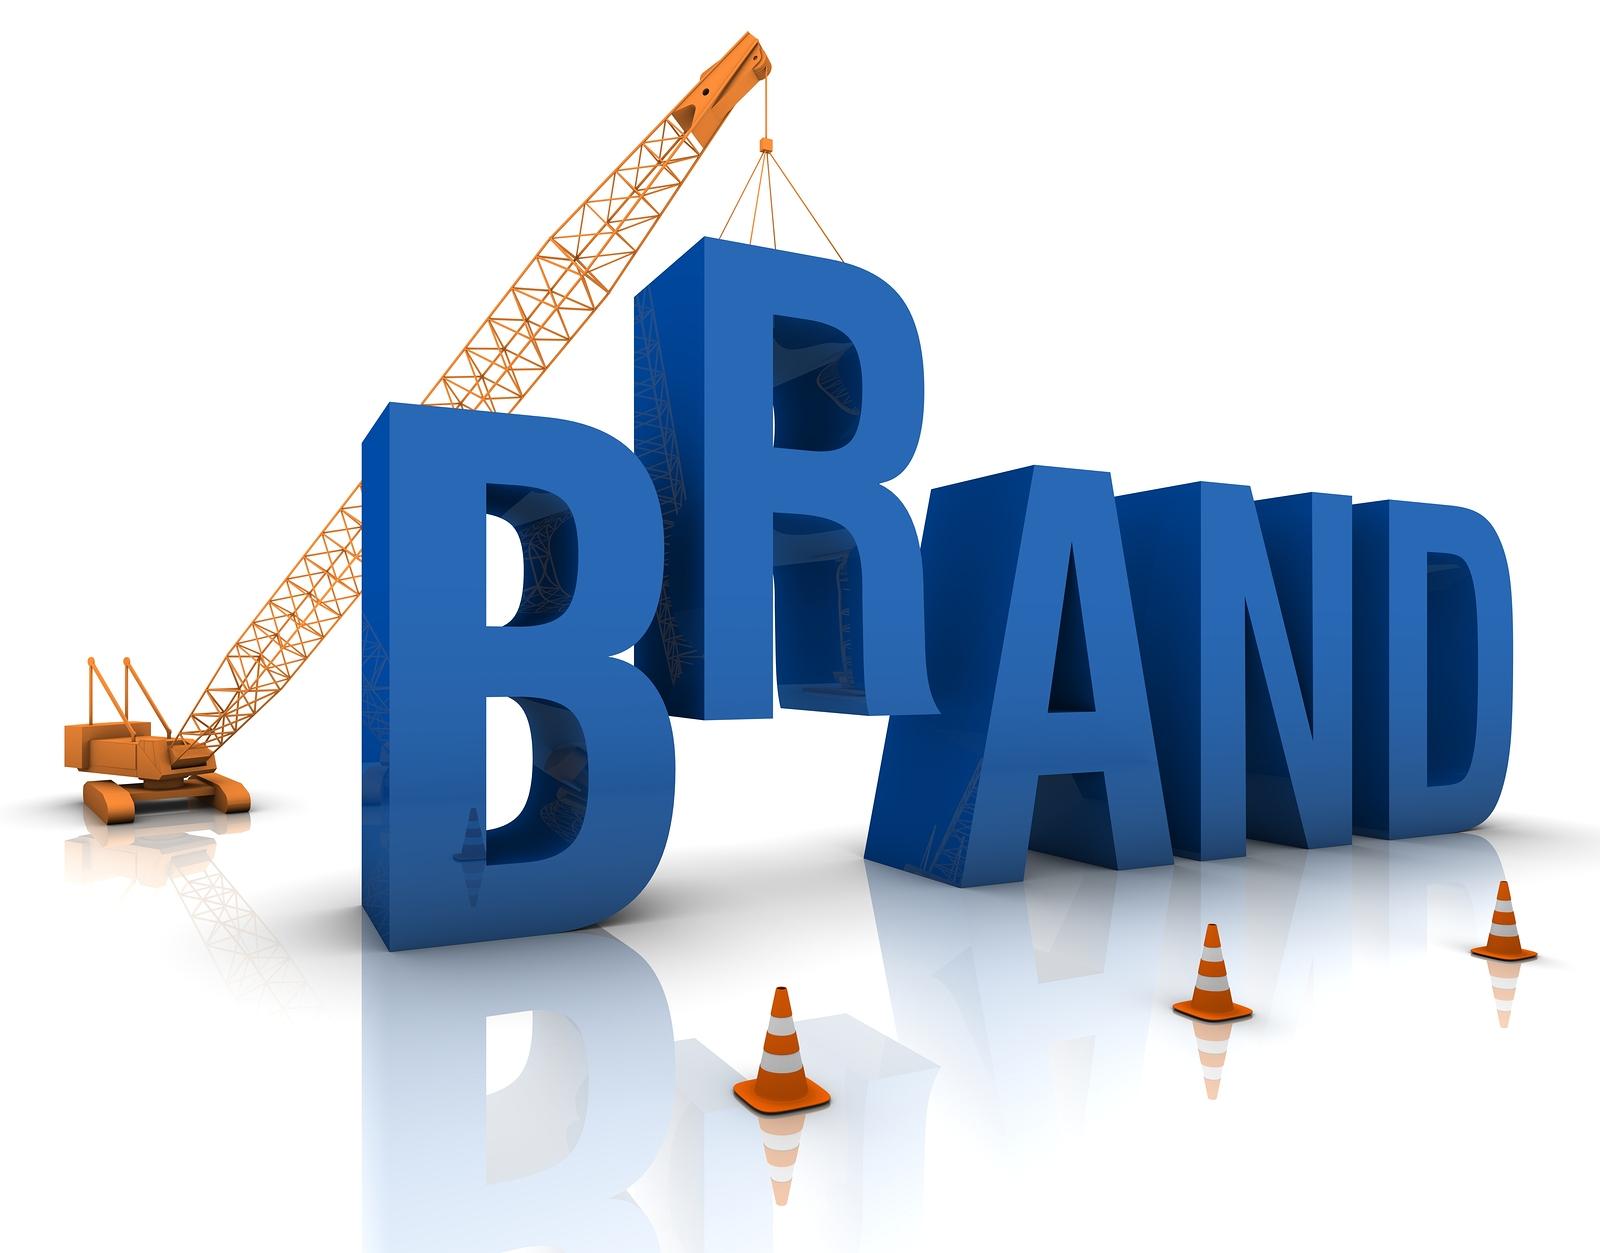 brand-building-wr-1